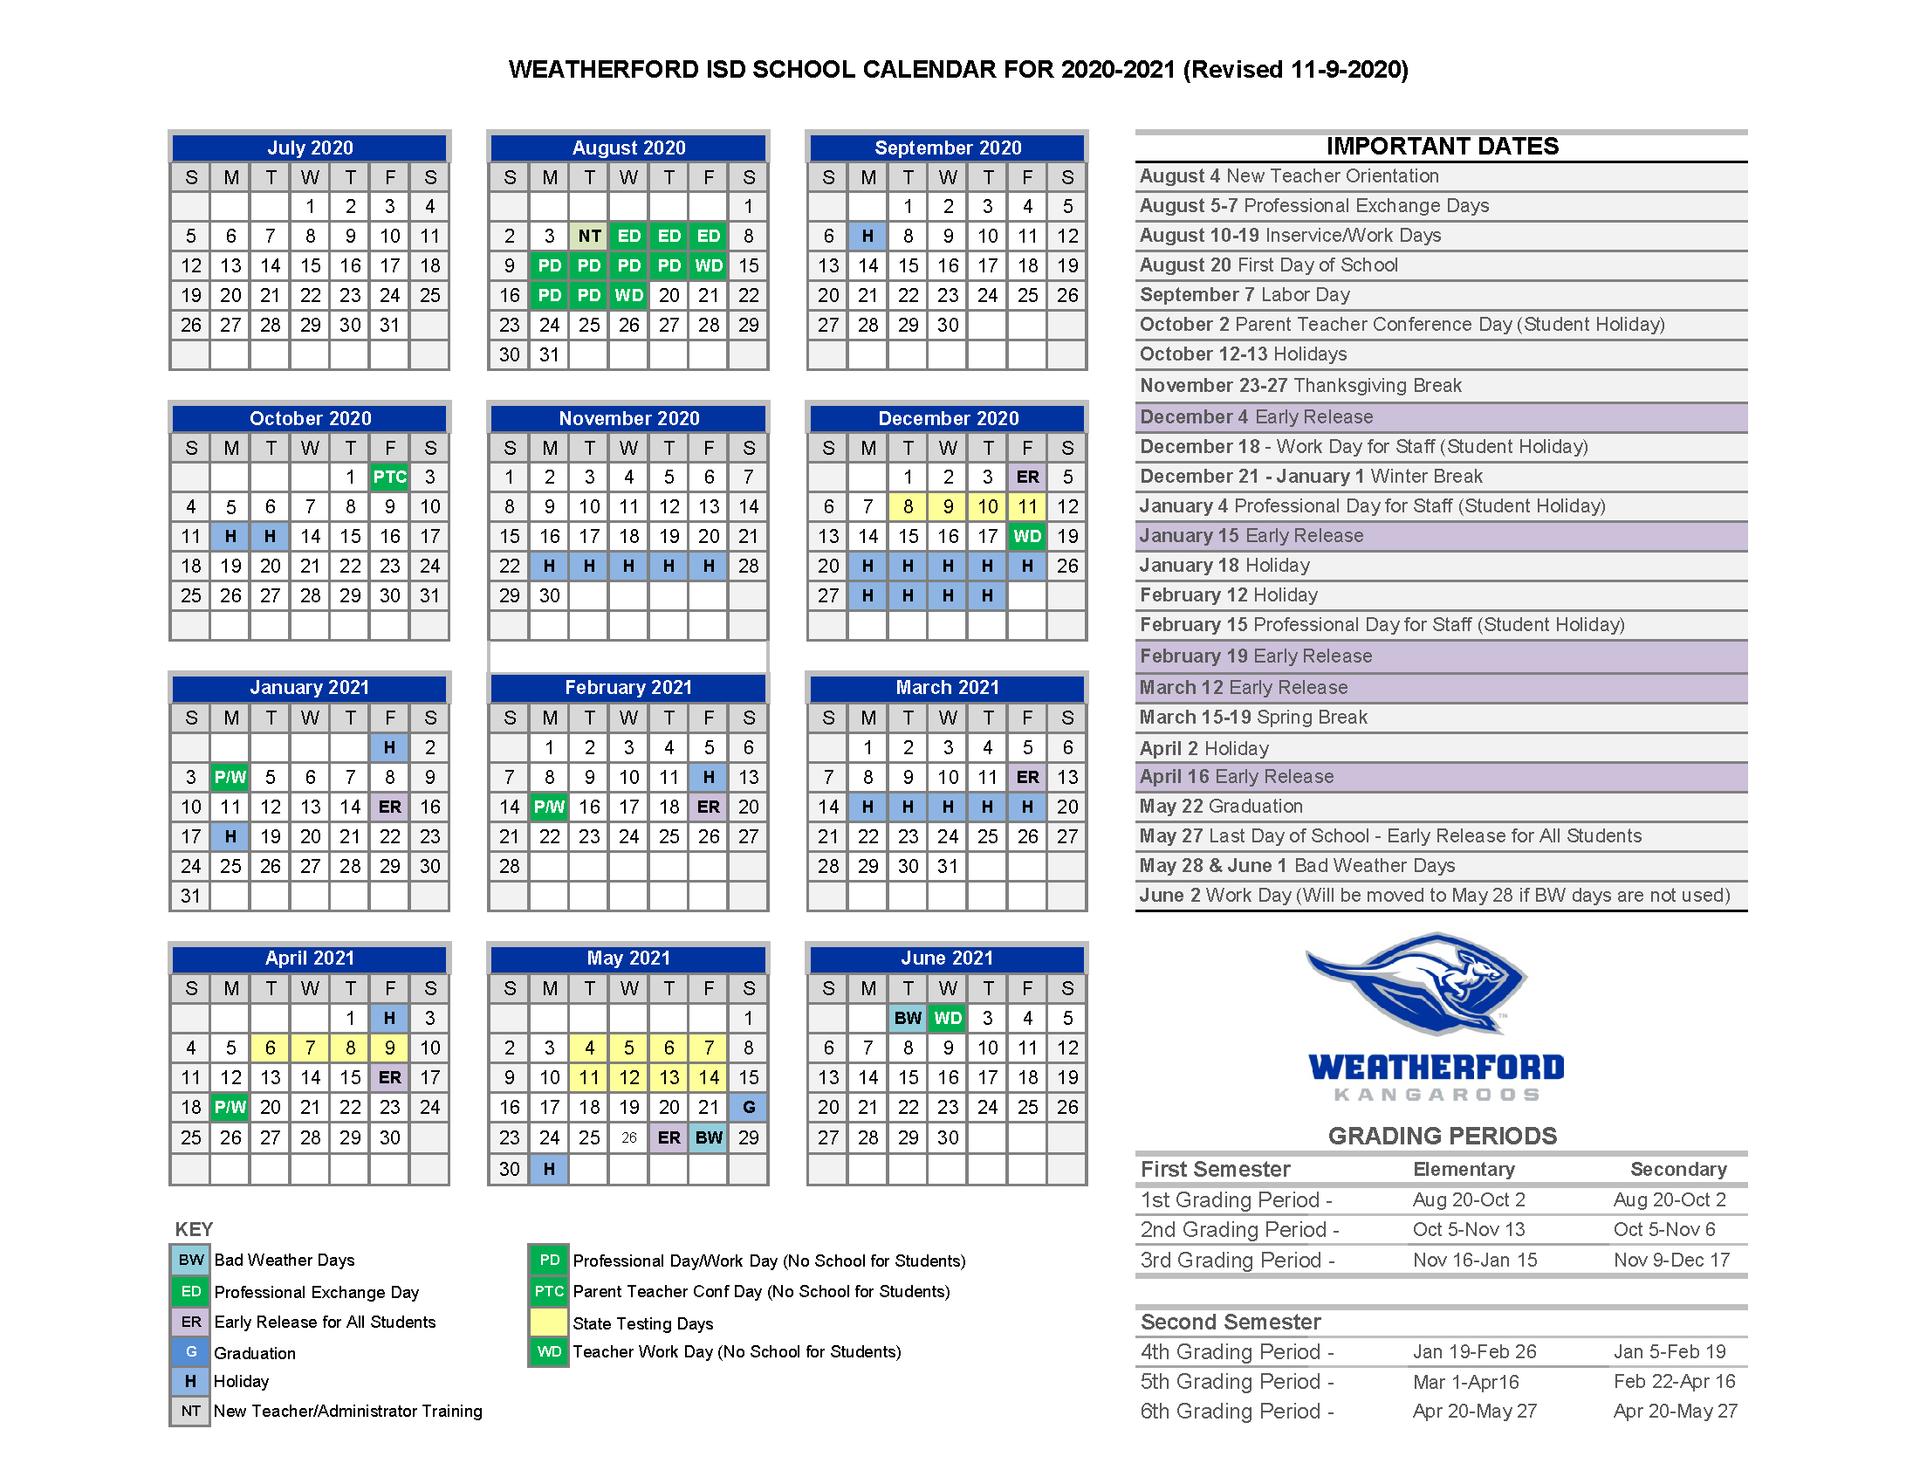 WISD School Calendar Image